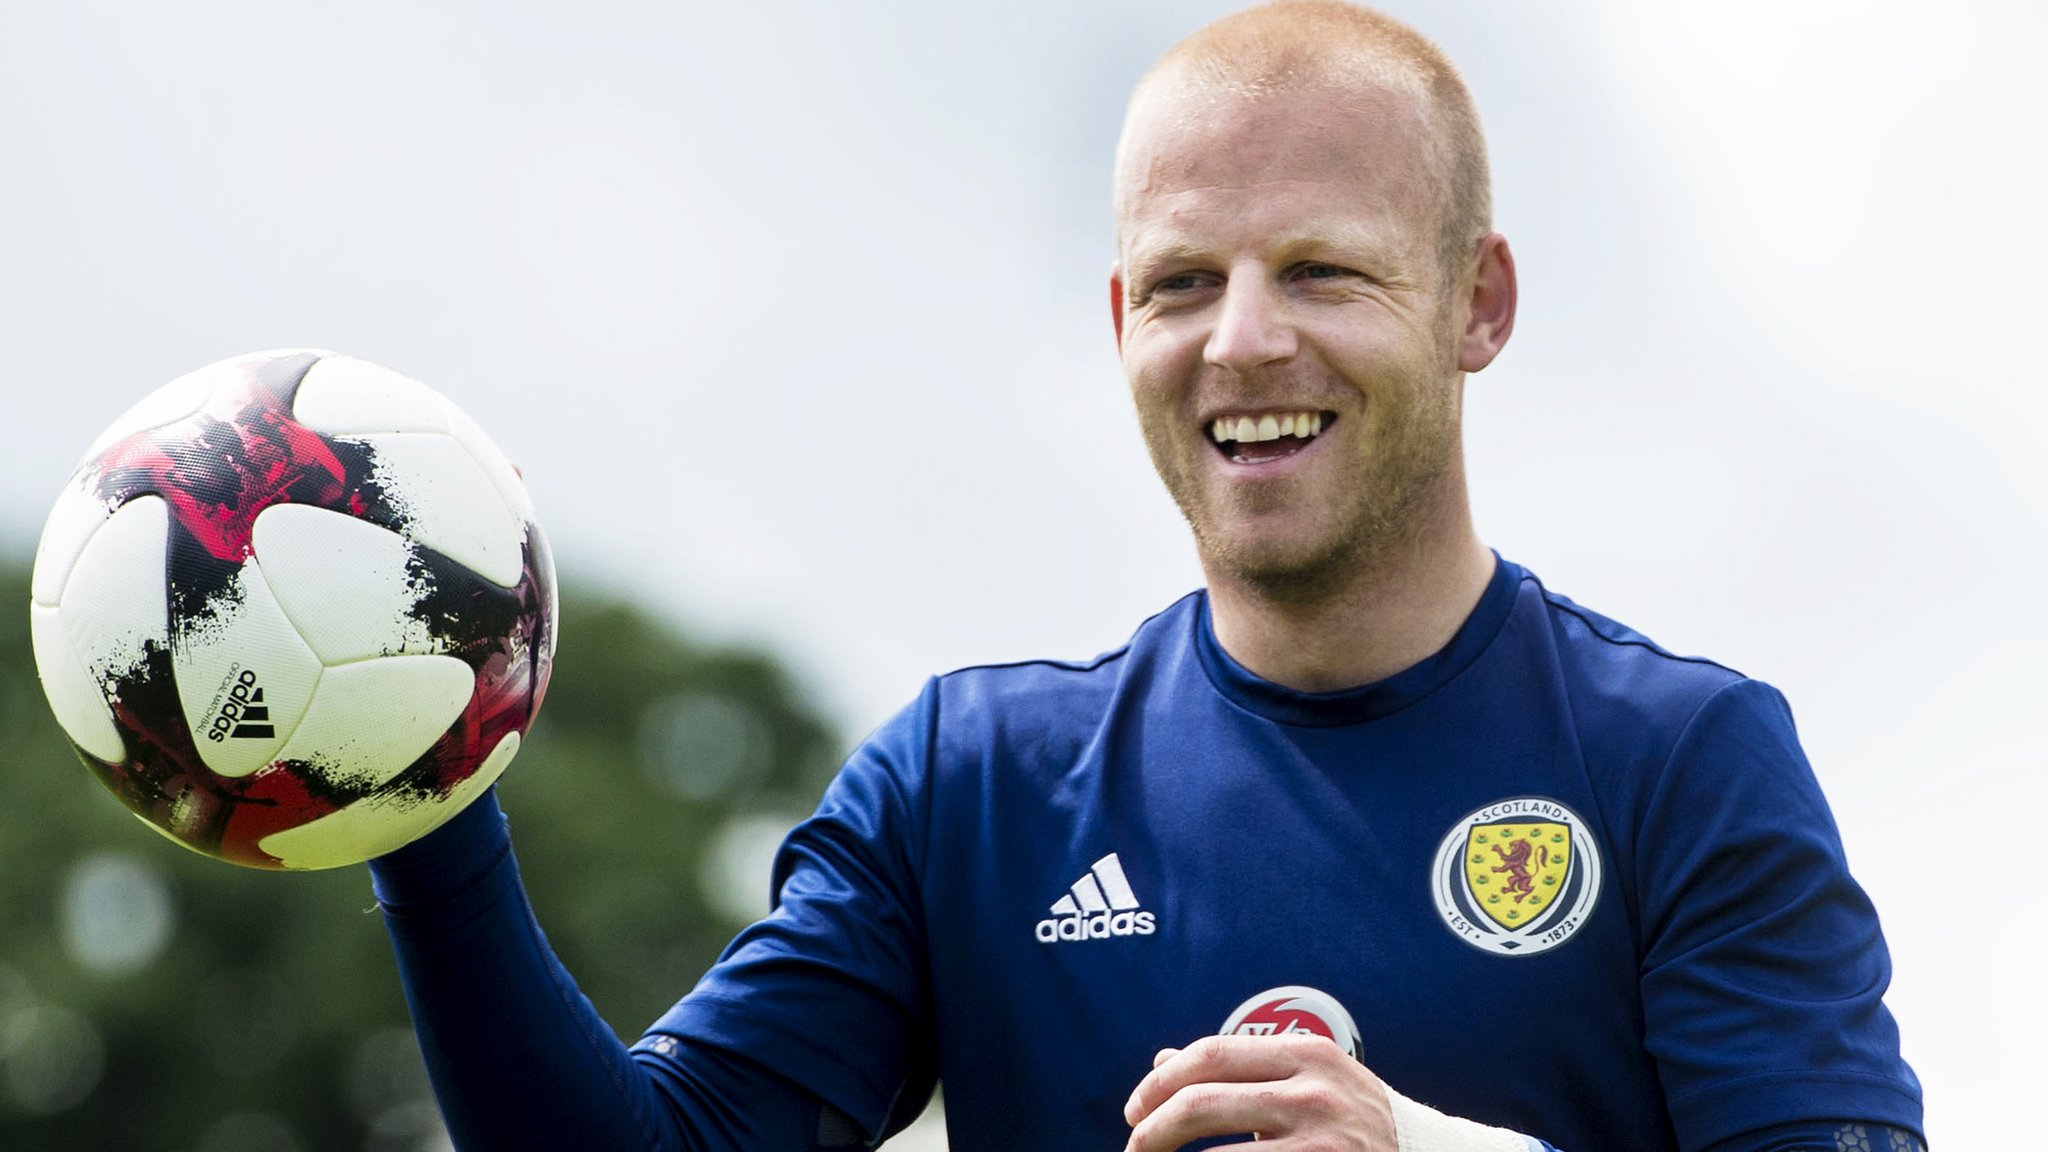 Scotland: Walter Smith 'safest bet' for manager's job - Steven Naismith